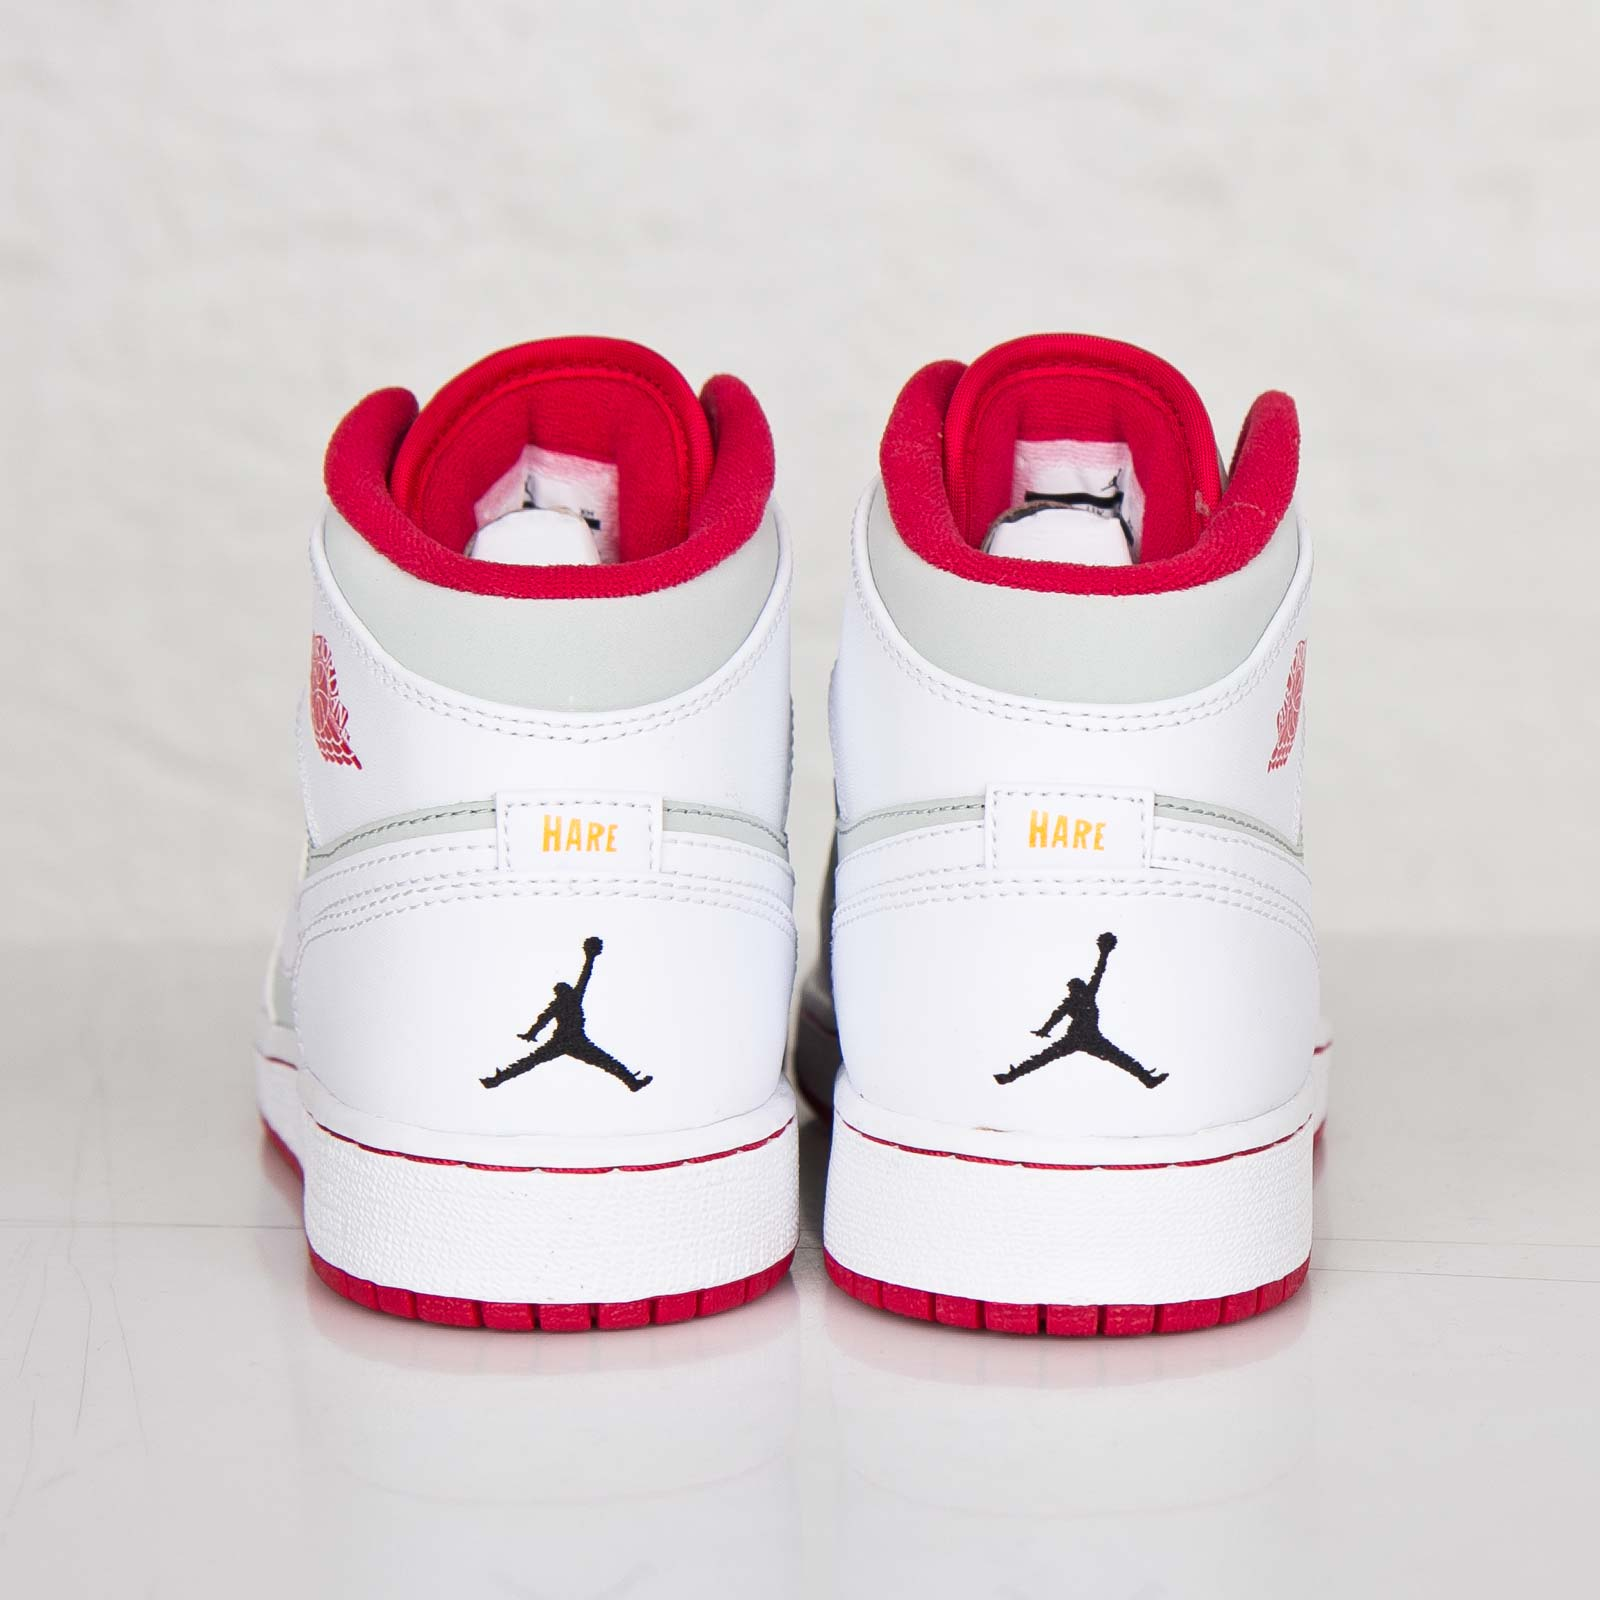 sports shoes a9b33 98963 Jordan Brand Air Jordan 1 Mid WB (GS) - 719554-123 - Sneakersnstuff    sneakers   streetwear online since 1999